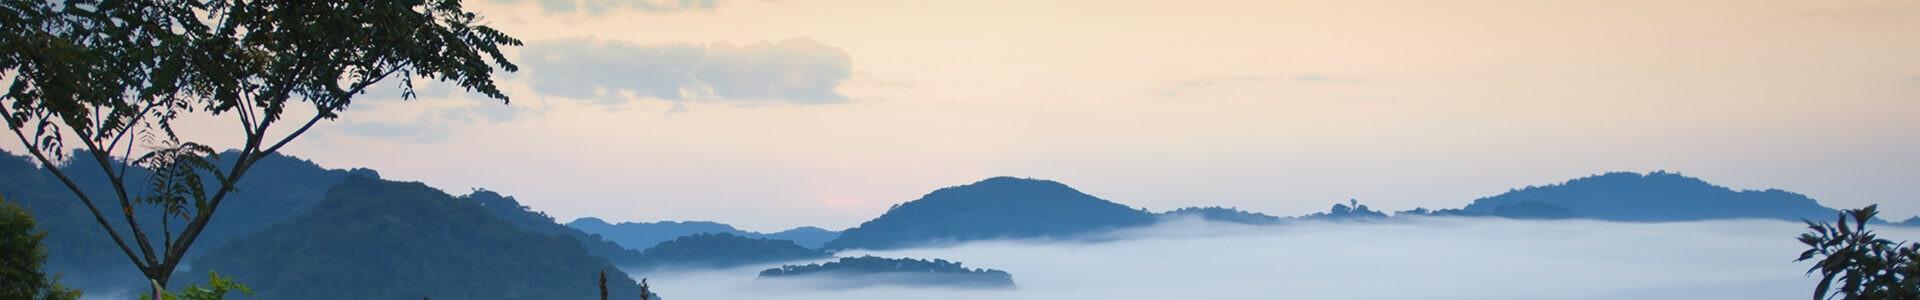 Voyage au Rwanda - TUI